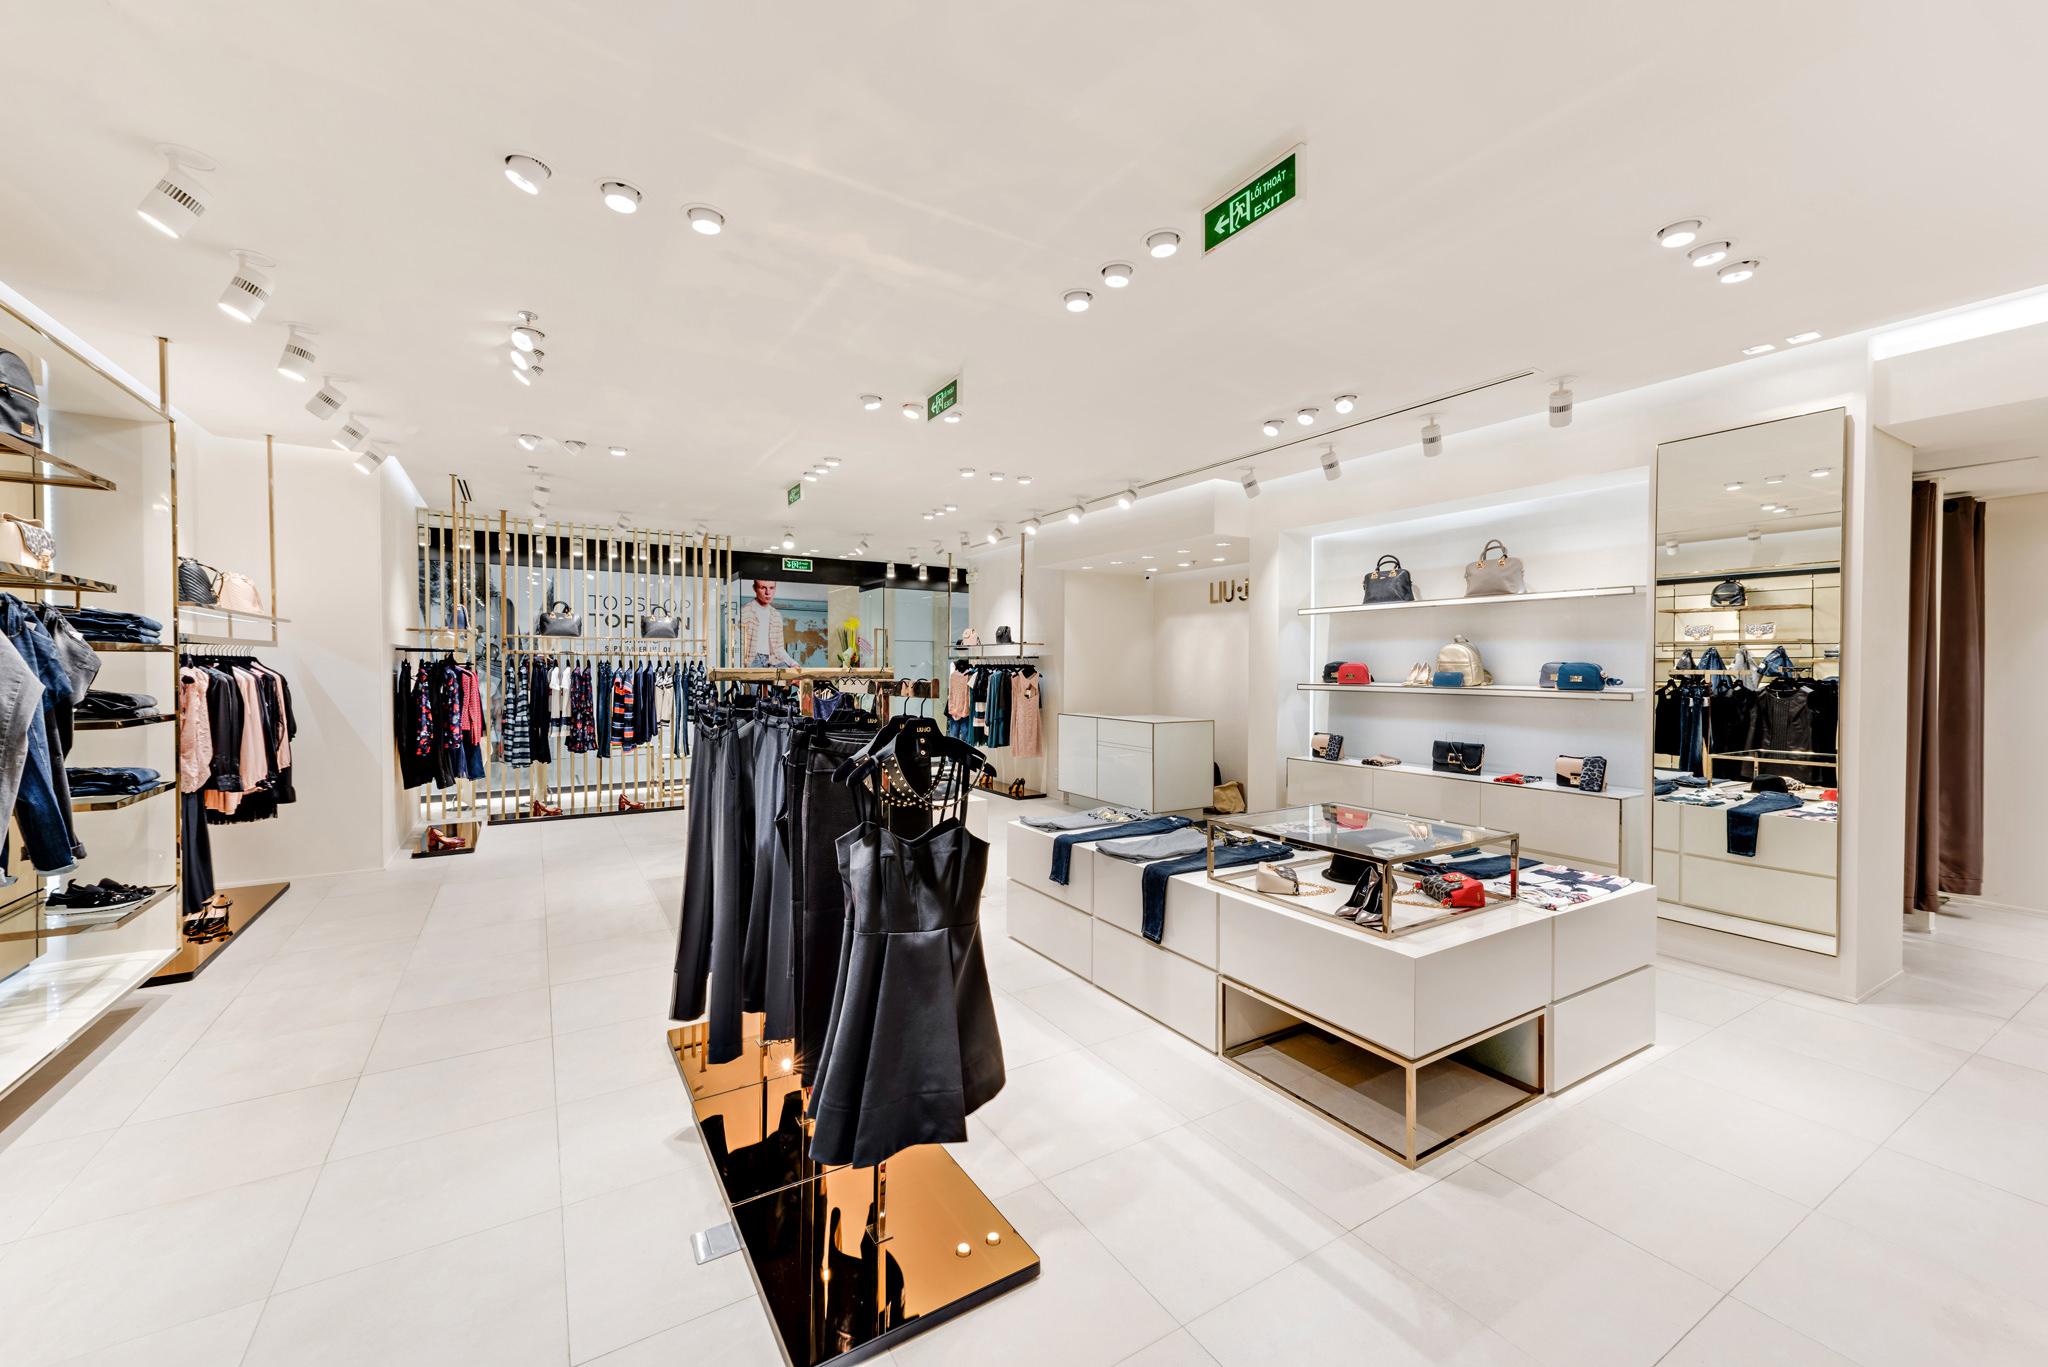 20160801 - Liu Jo - HCM - Commercial - Interior - Store - Retouch 0006.jpg